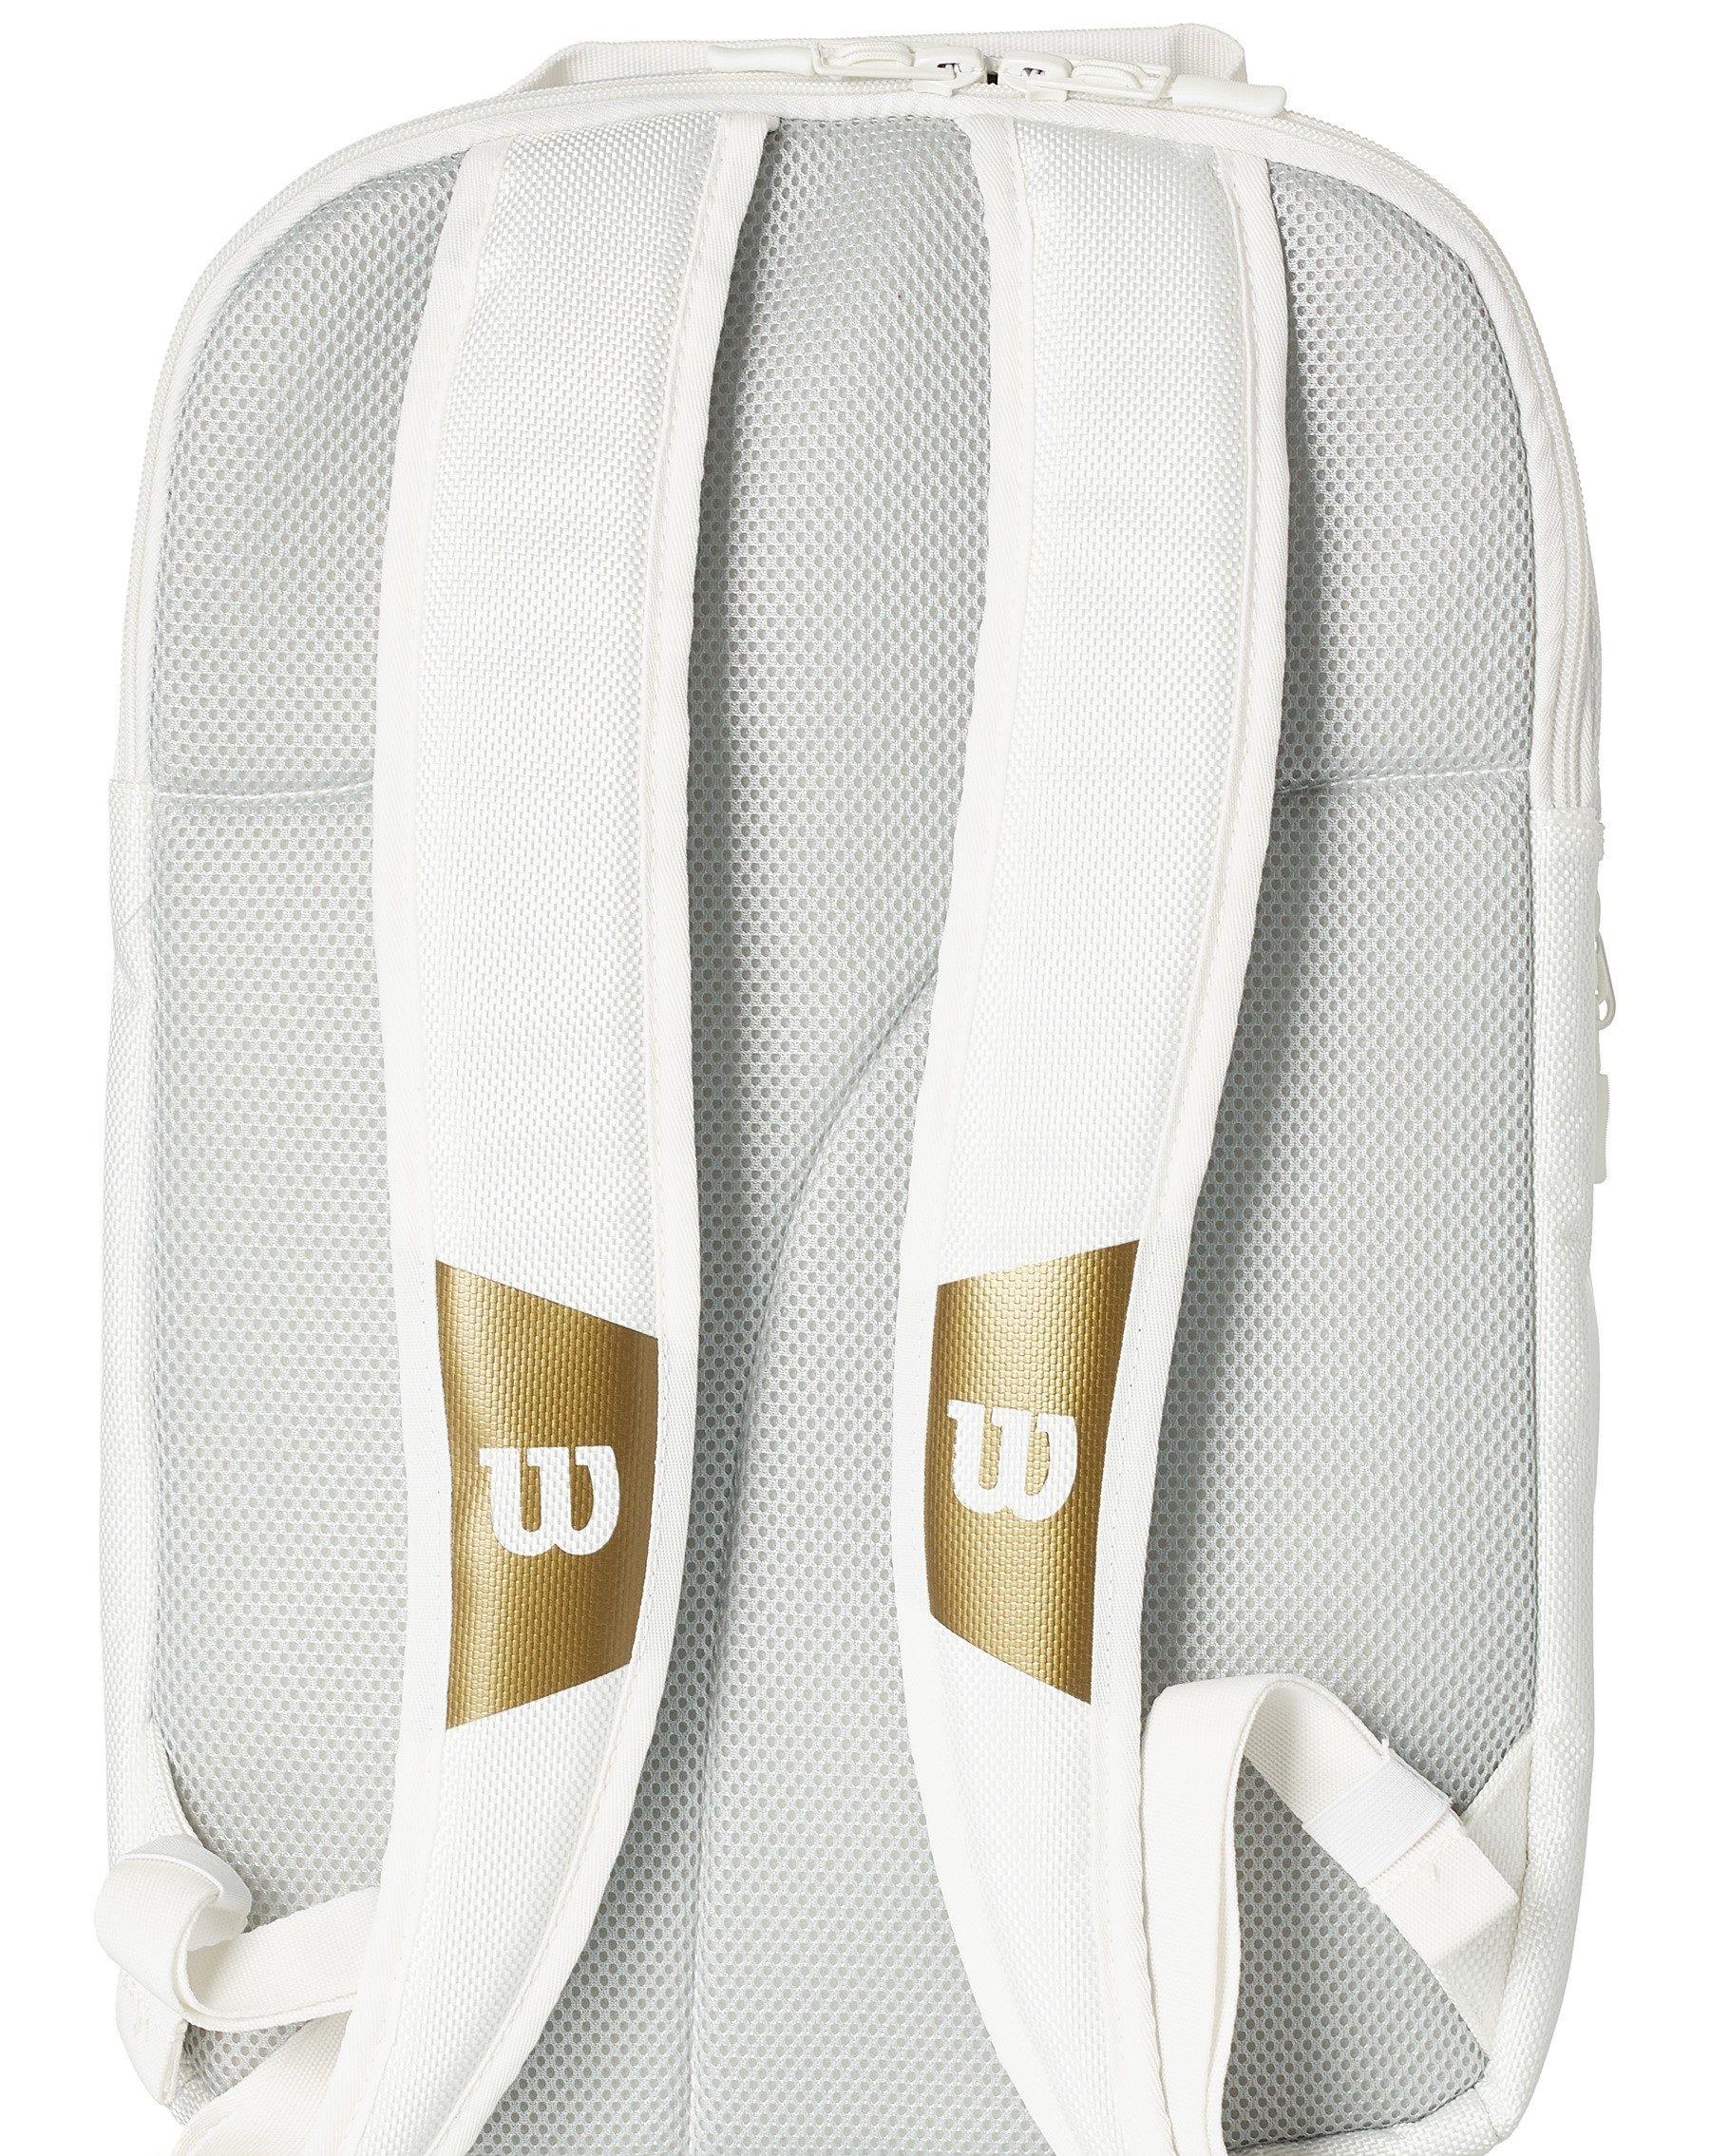 Wilson Federer DNA Backack Bag Wimbledon Limited Edition - White/Gold